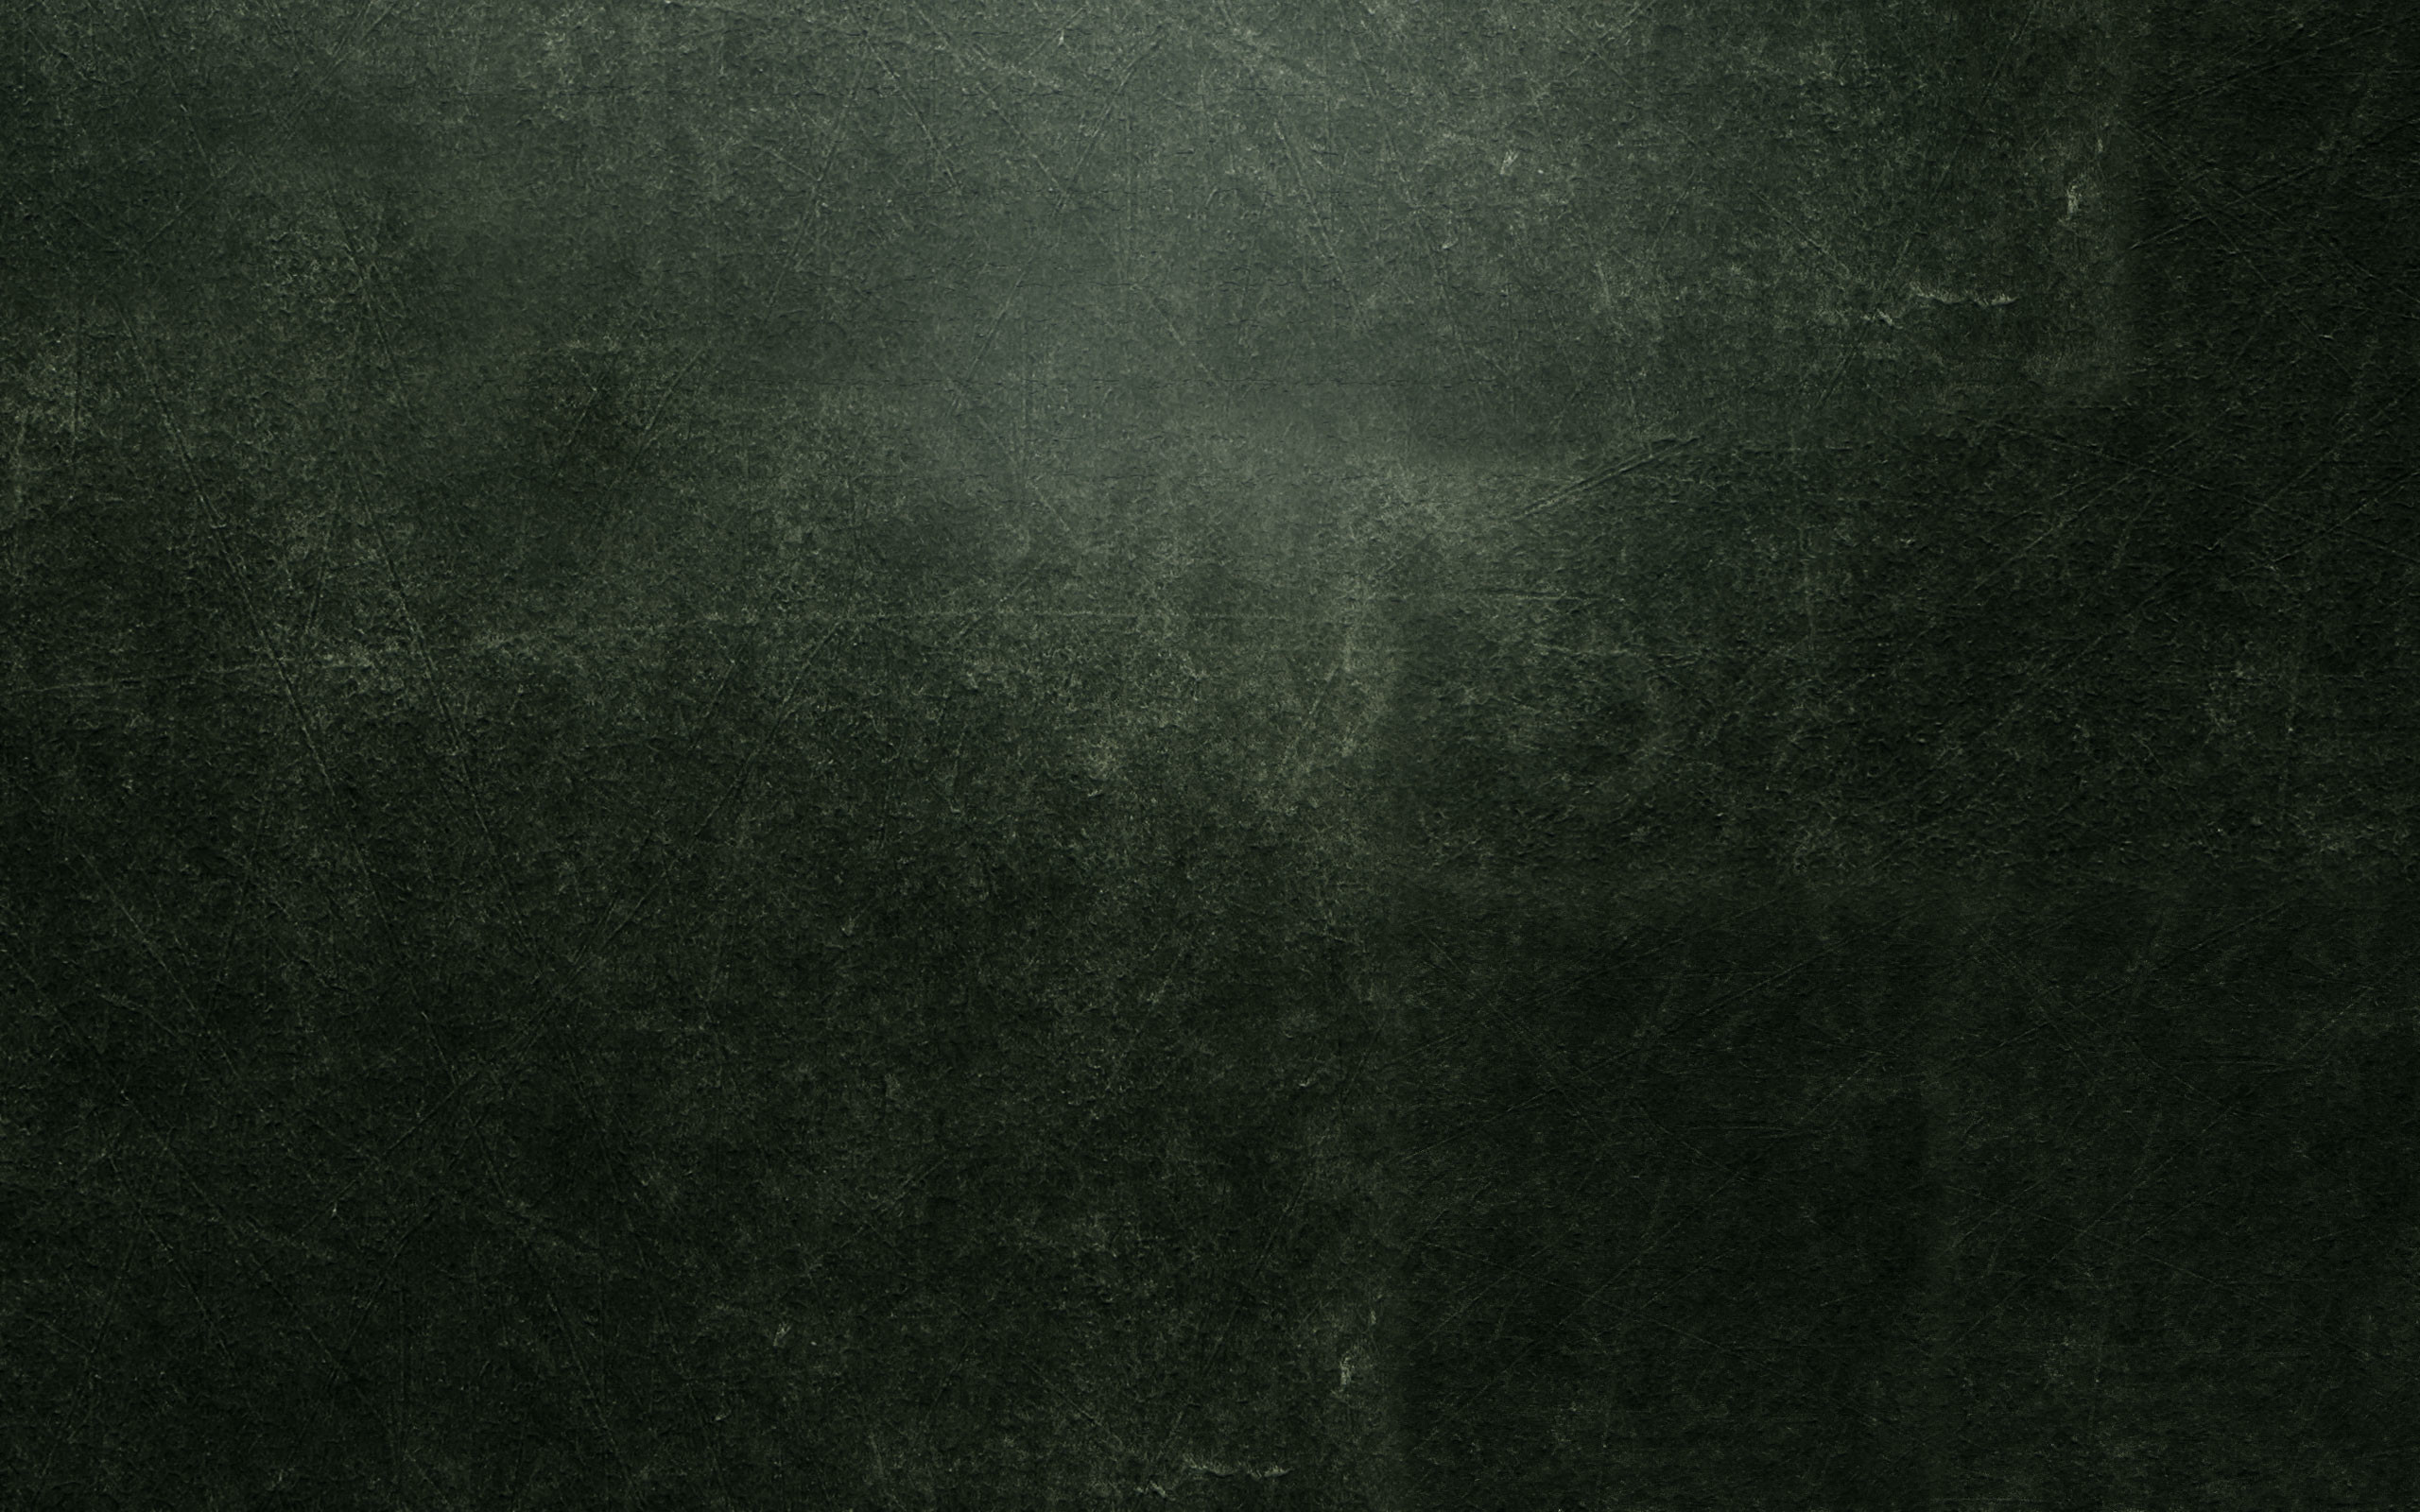 #dark #wallpapers via https://www.wallsave.com